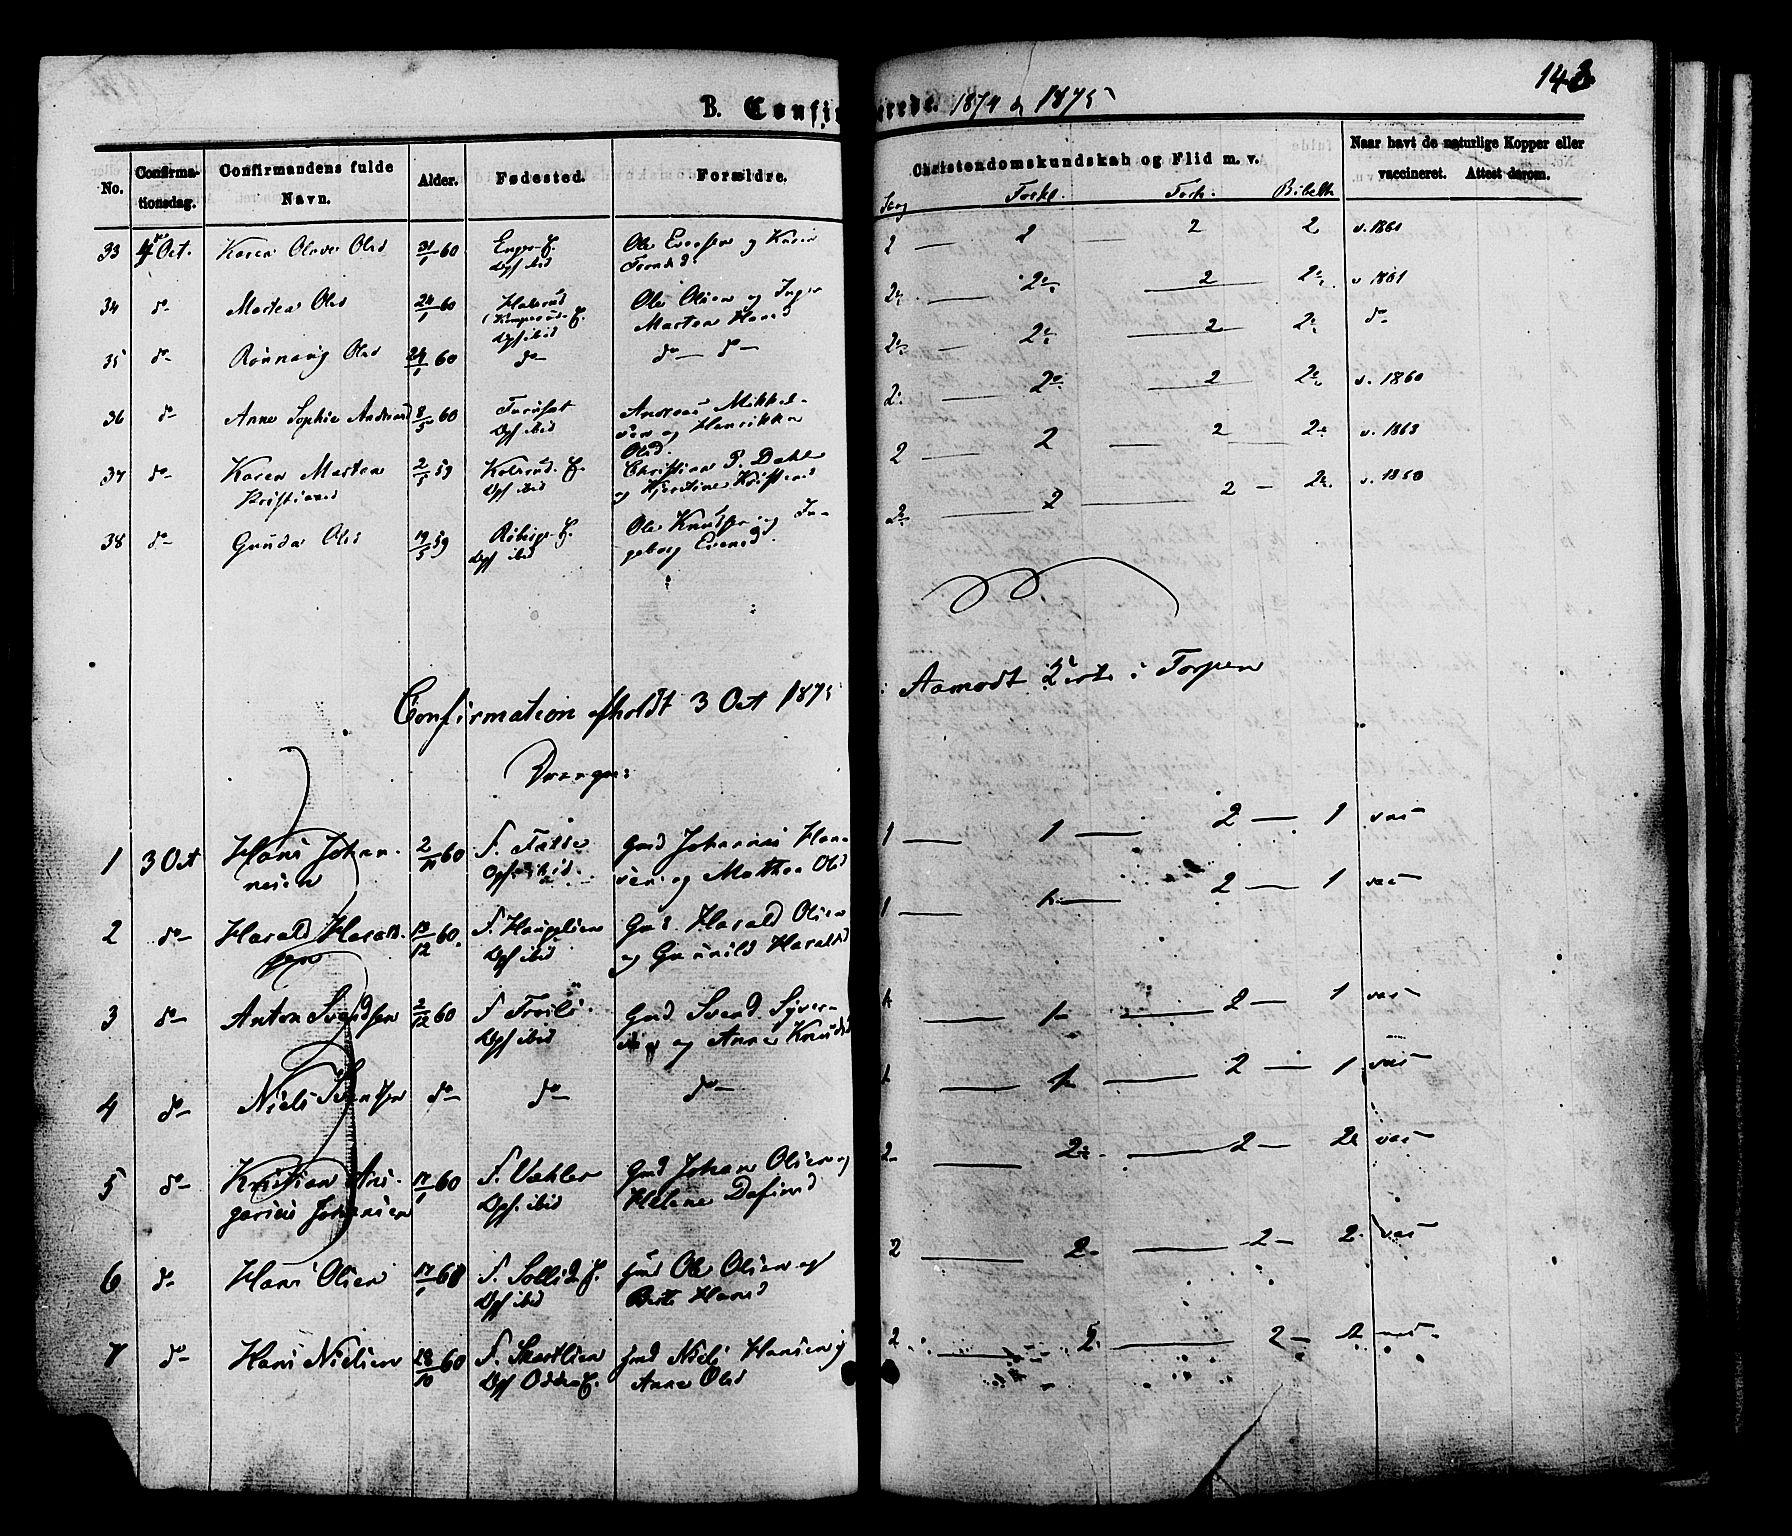 SAH, Nordre Land prestekontor, Ministerialbok nr. 2, 1872-1881, s. 143